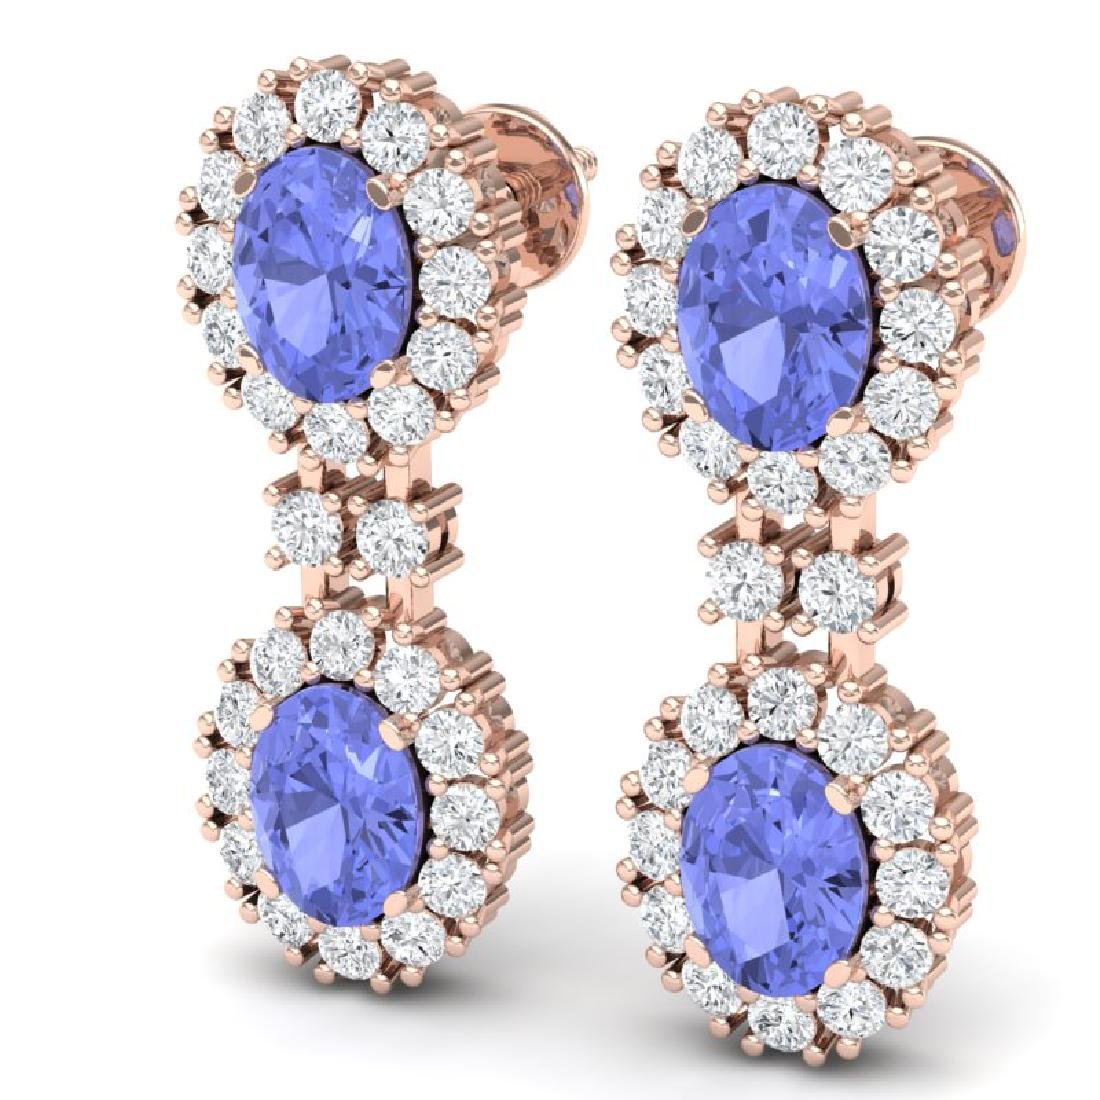 8.35 CTW Royalty Tanzanite & VS Diamond Earrings 18K - 2